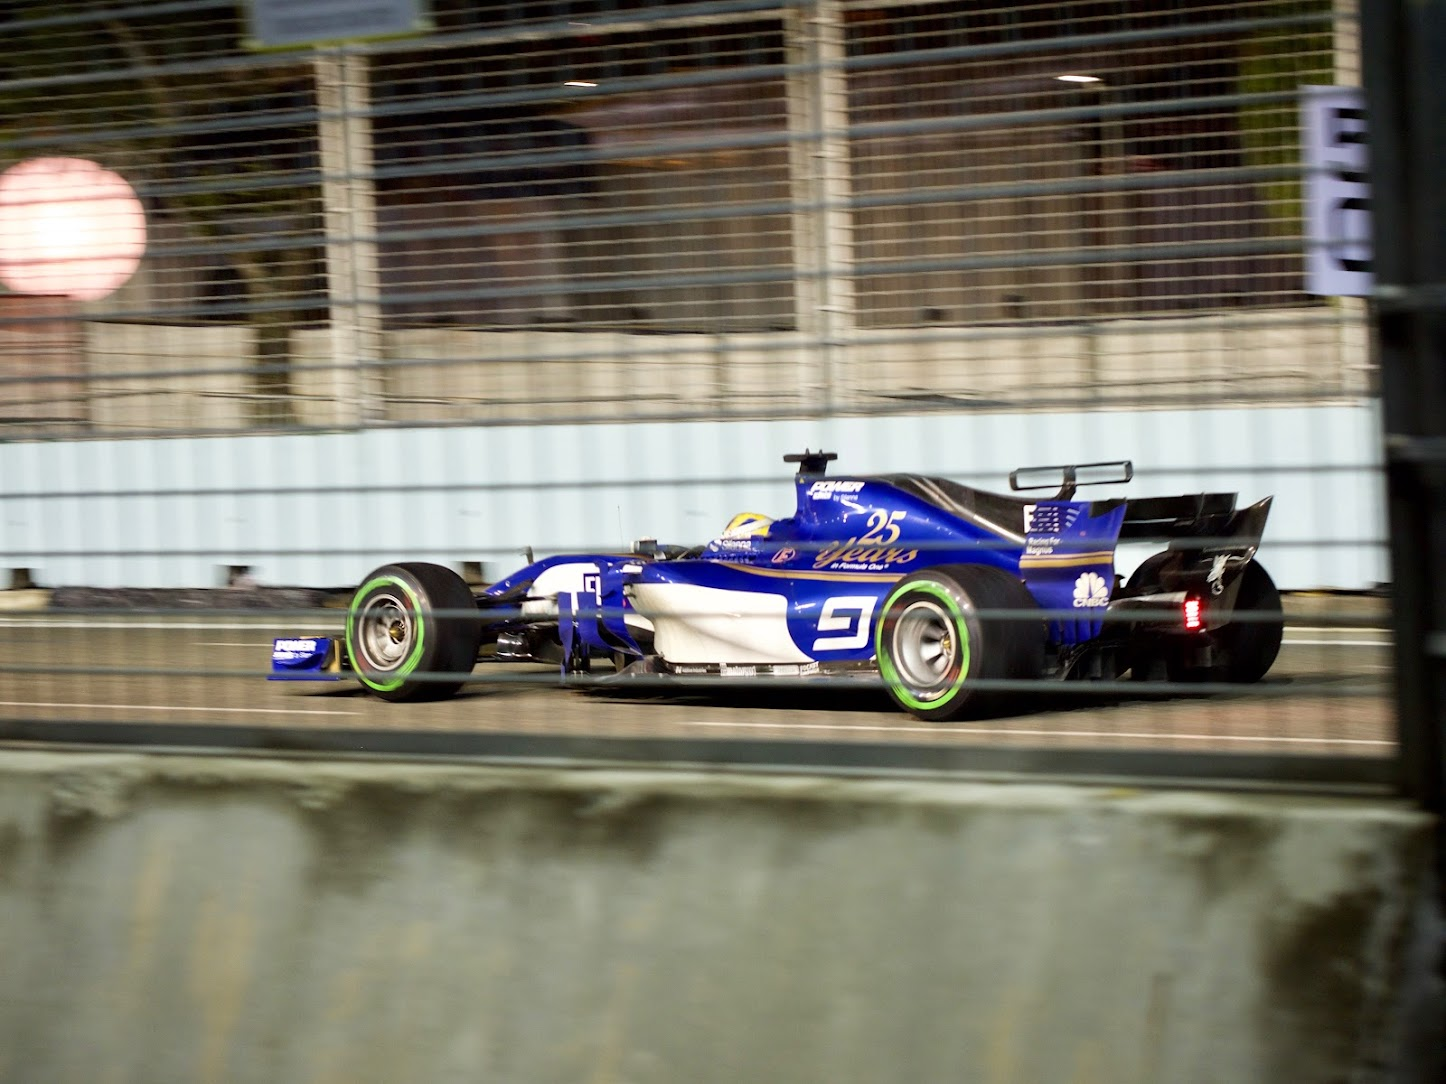 Singapore GP 2017 Race